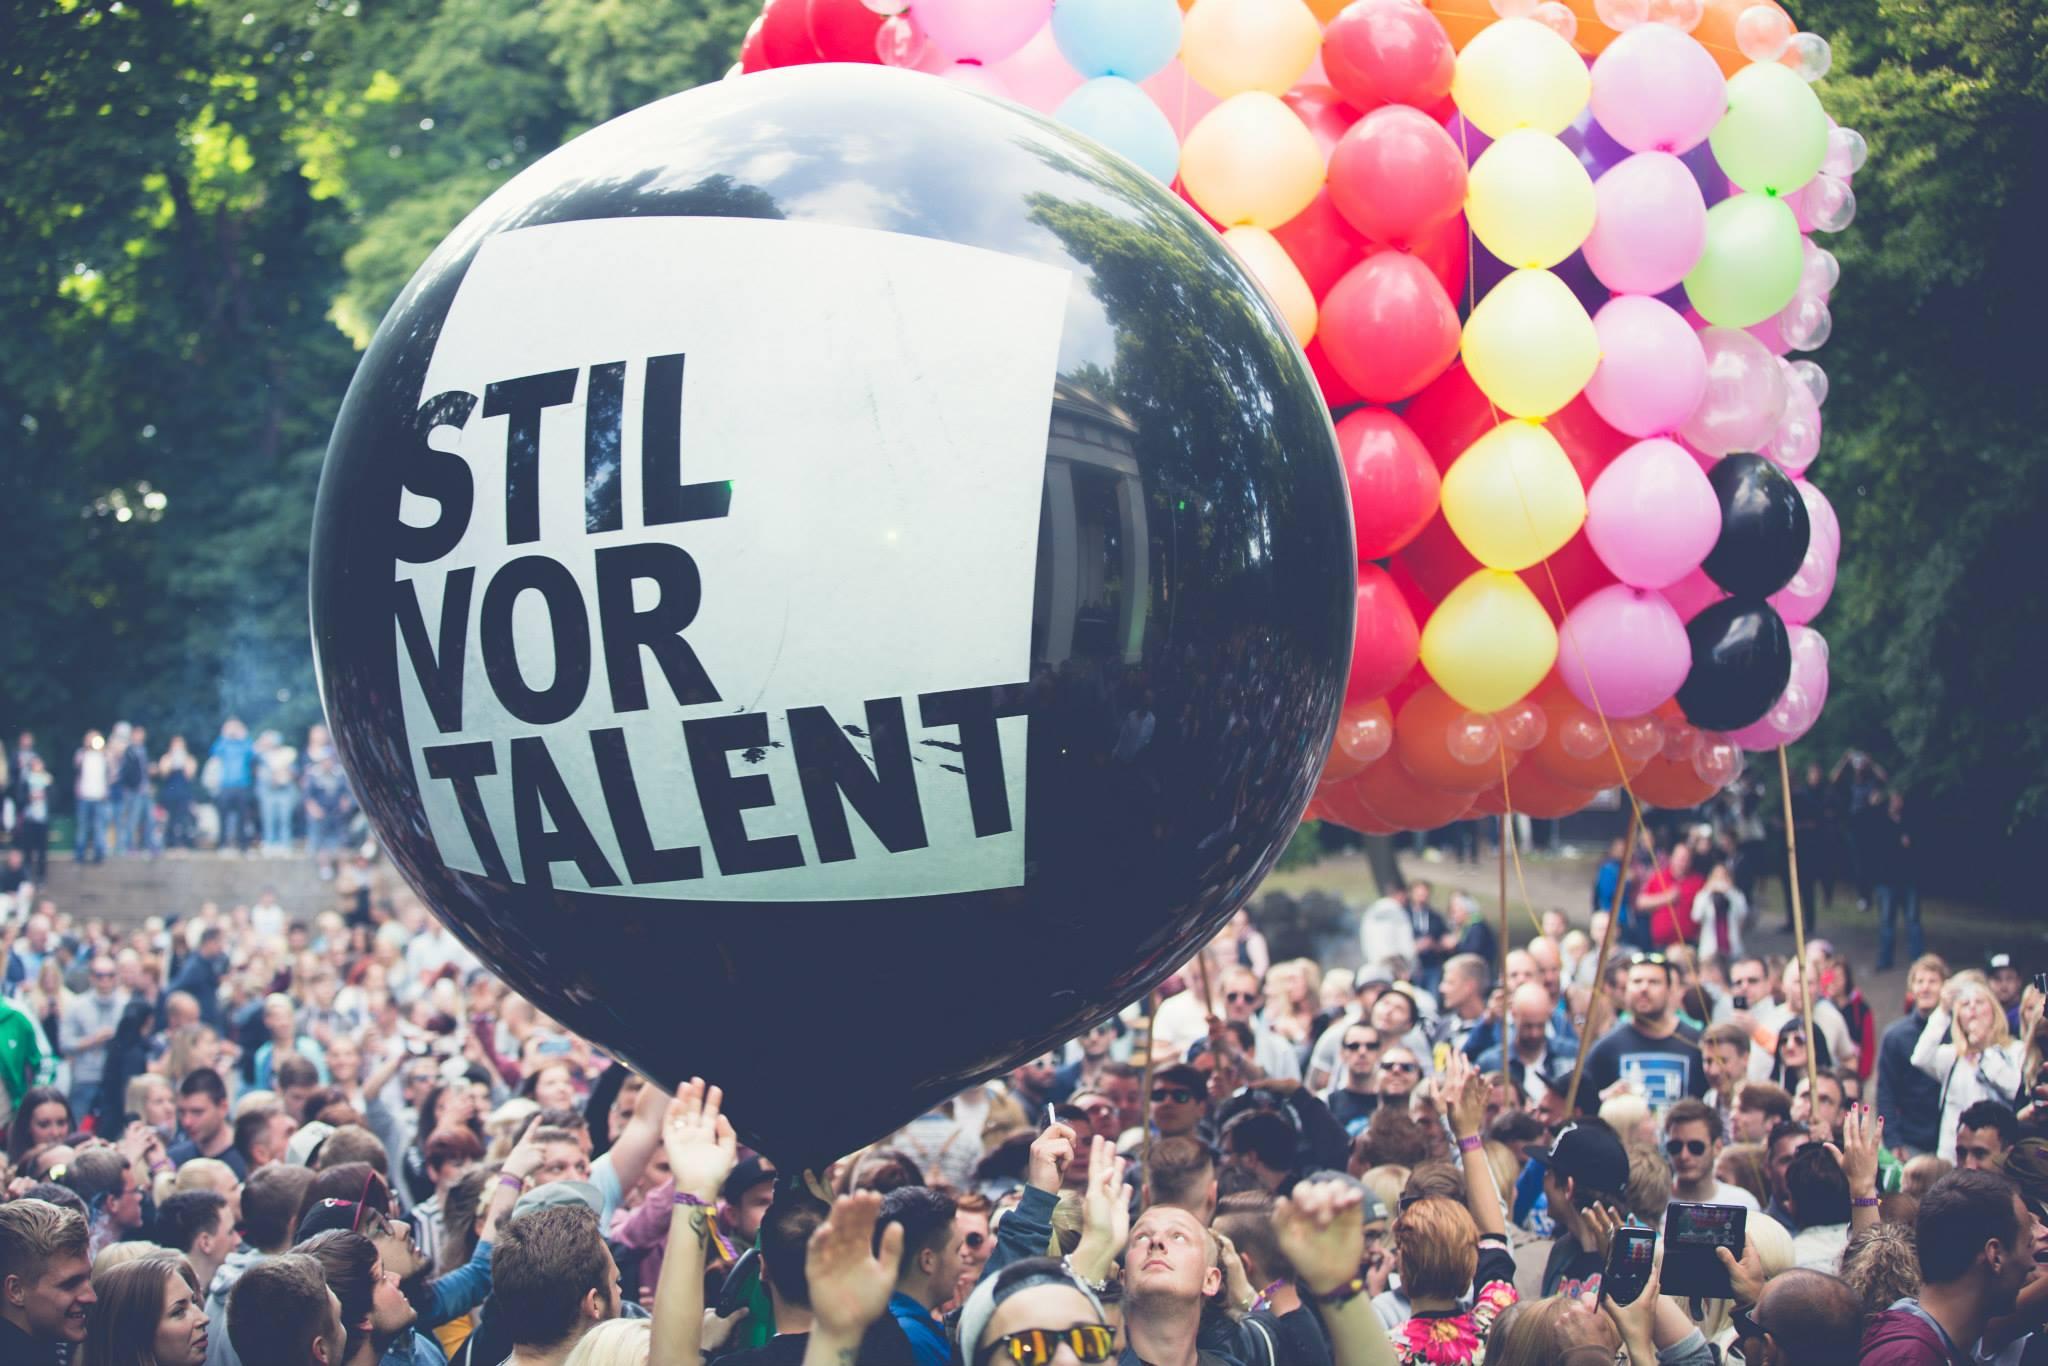 tilvortalent-festival-berlin-rummelsburg